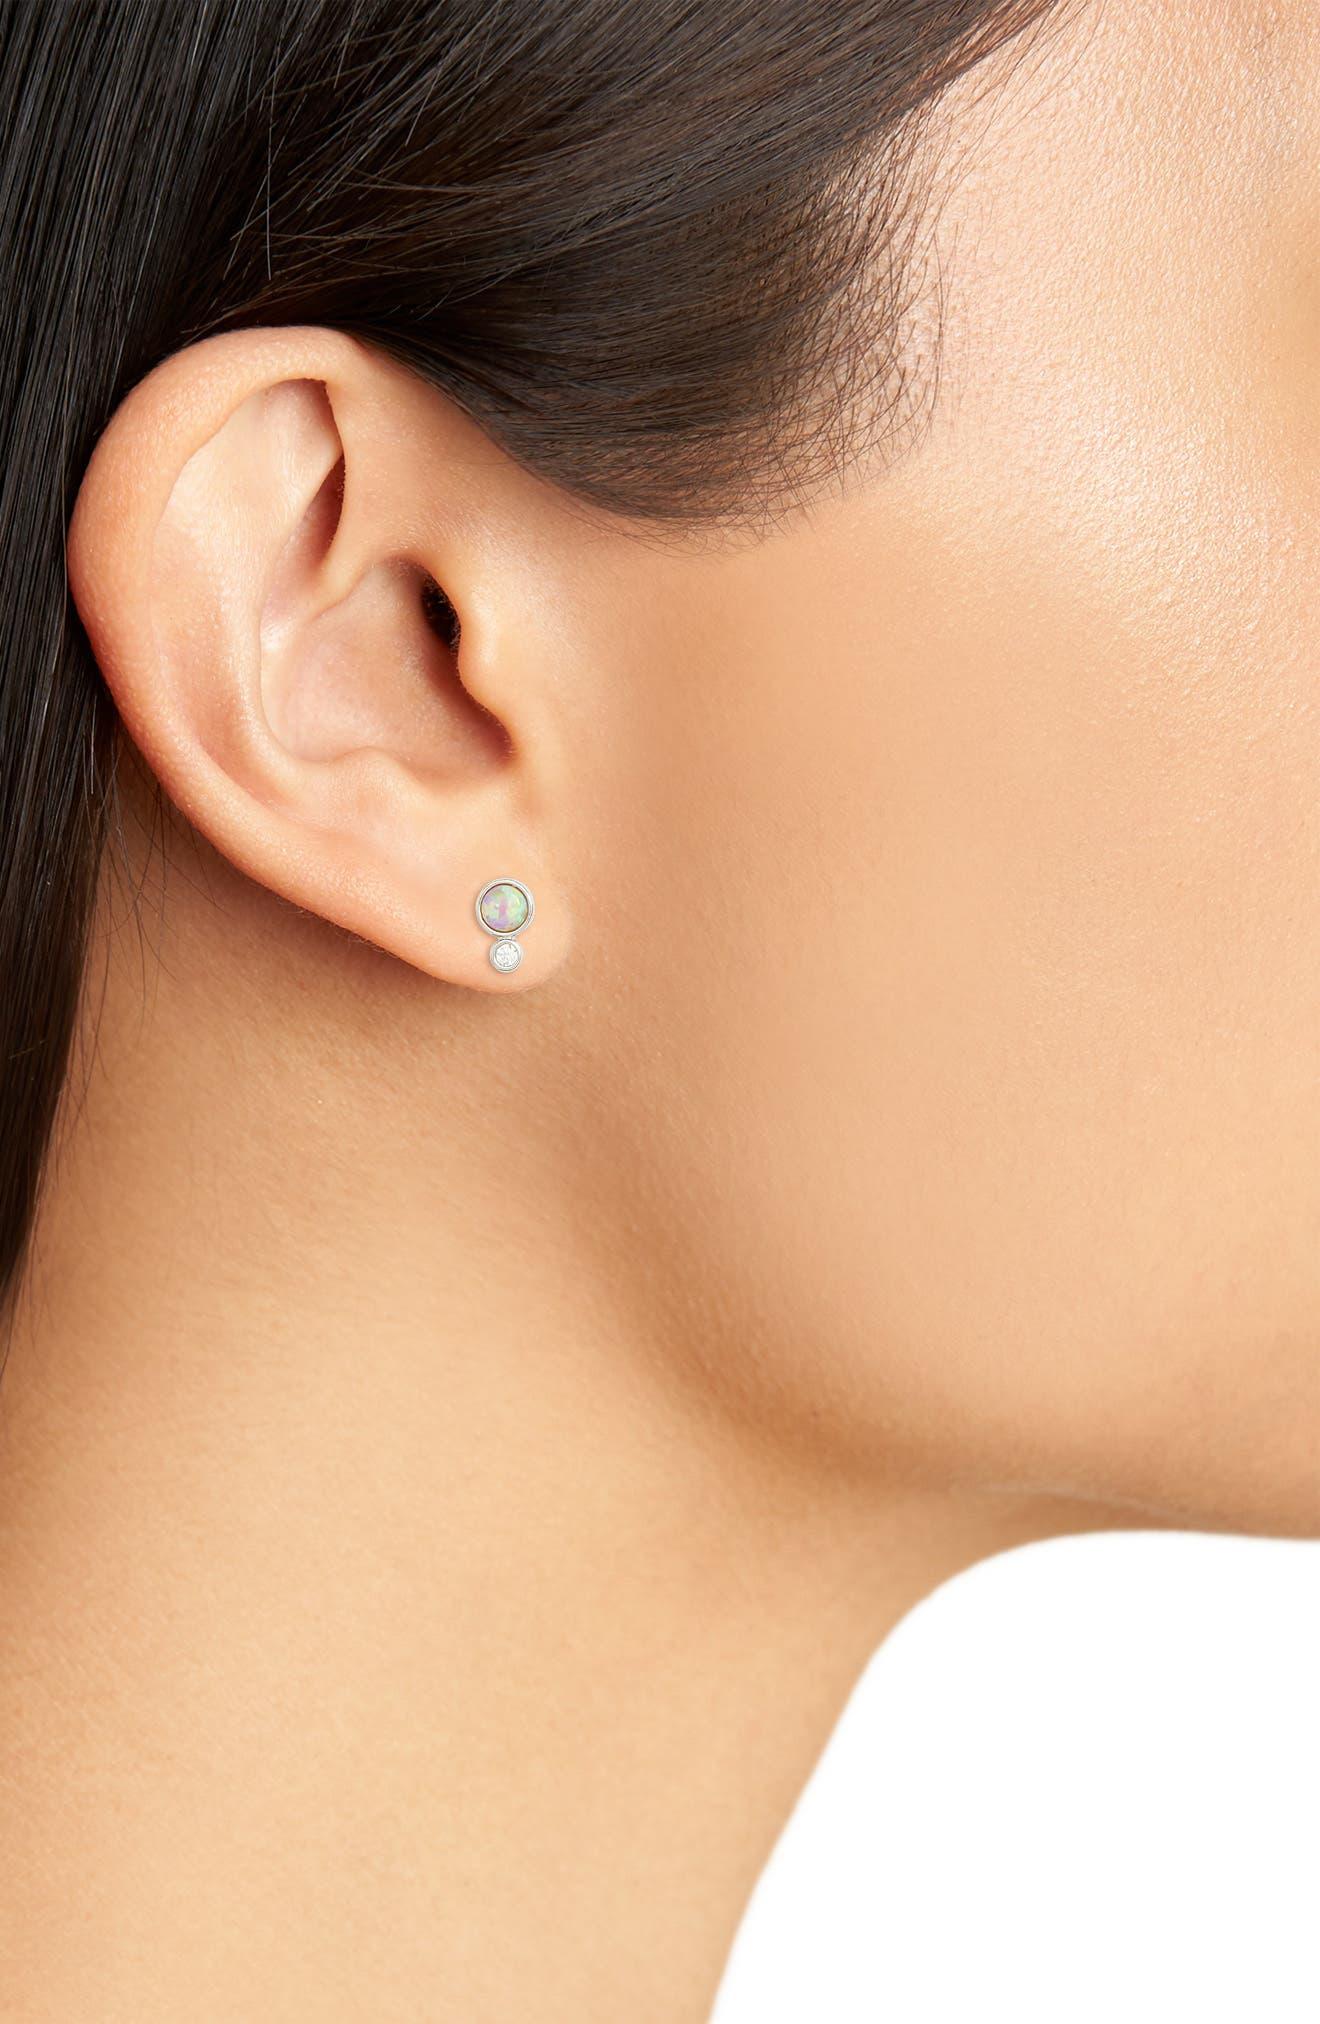 Set of 2 Opal & Cubic Zirconia Stud Earrings,                             Alternate thumbnail 2, color,                             Platinum